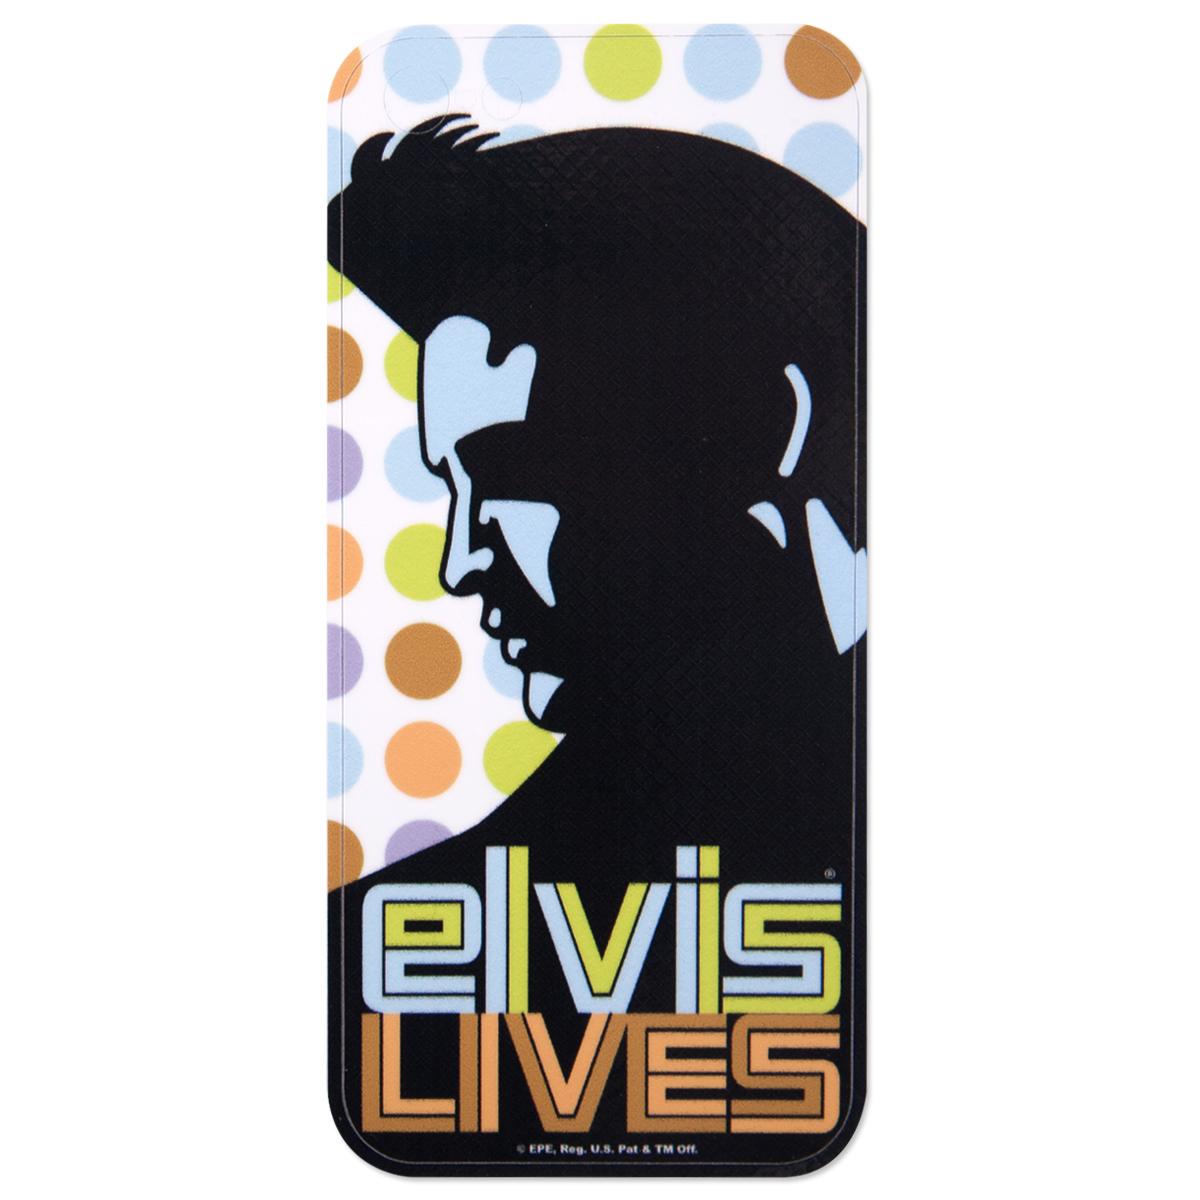 Elvis Elvis Lives iPhone 5 Skin